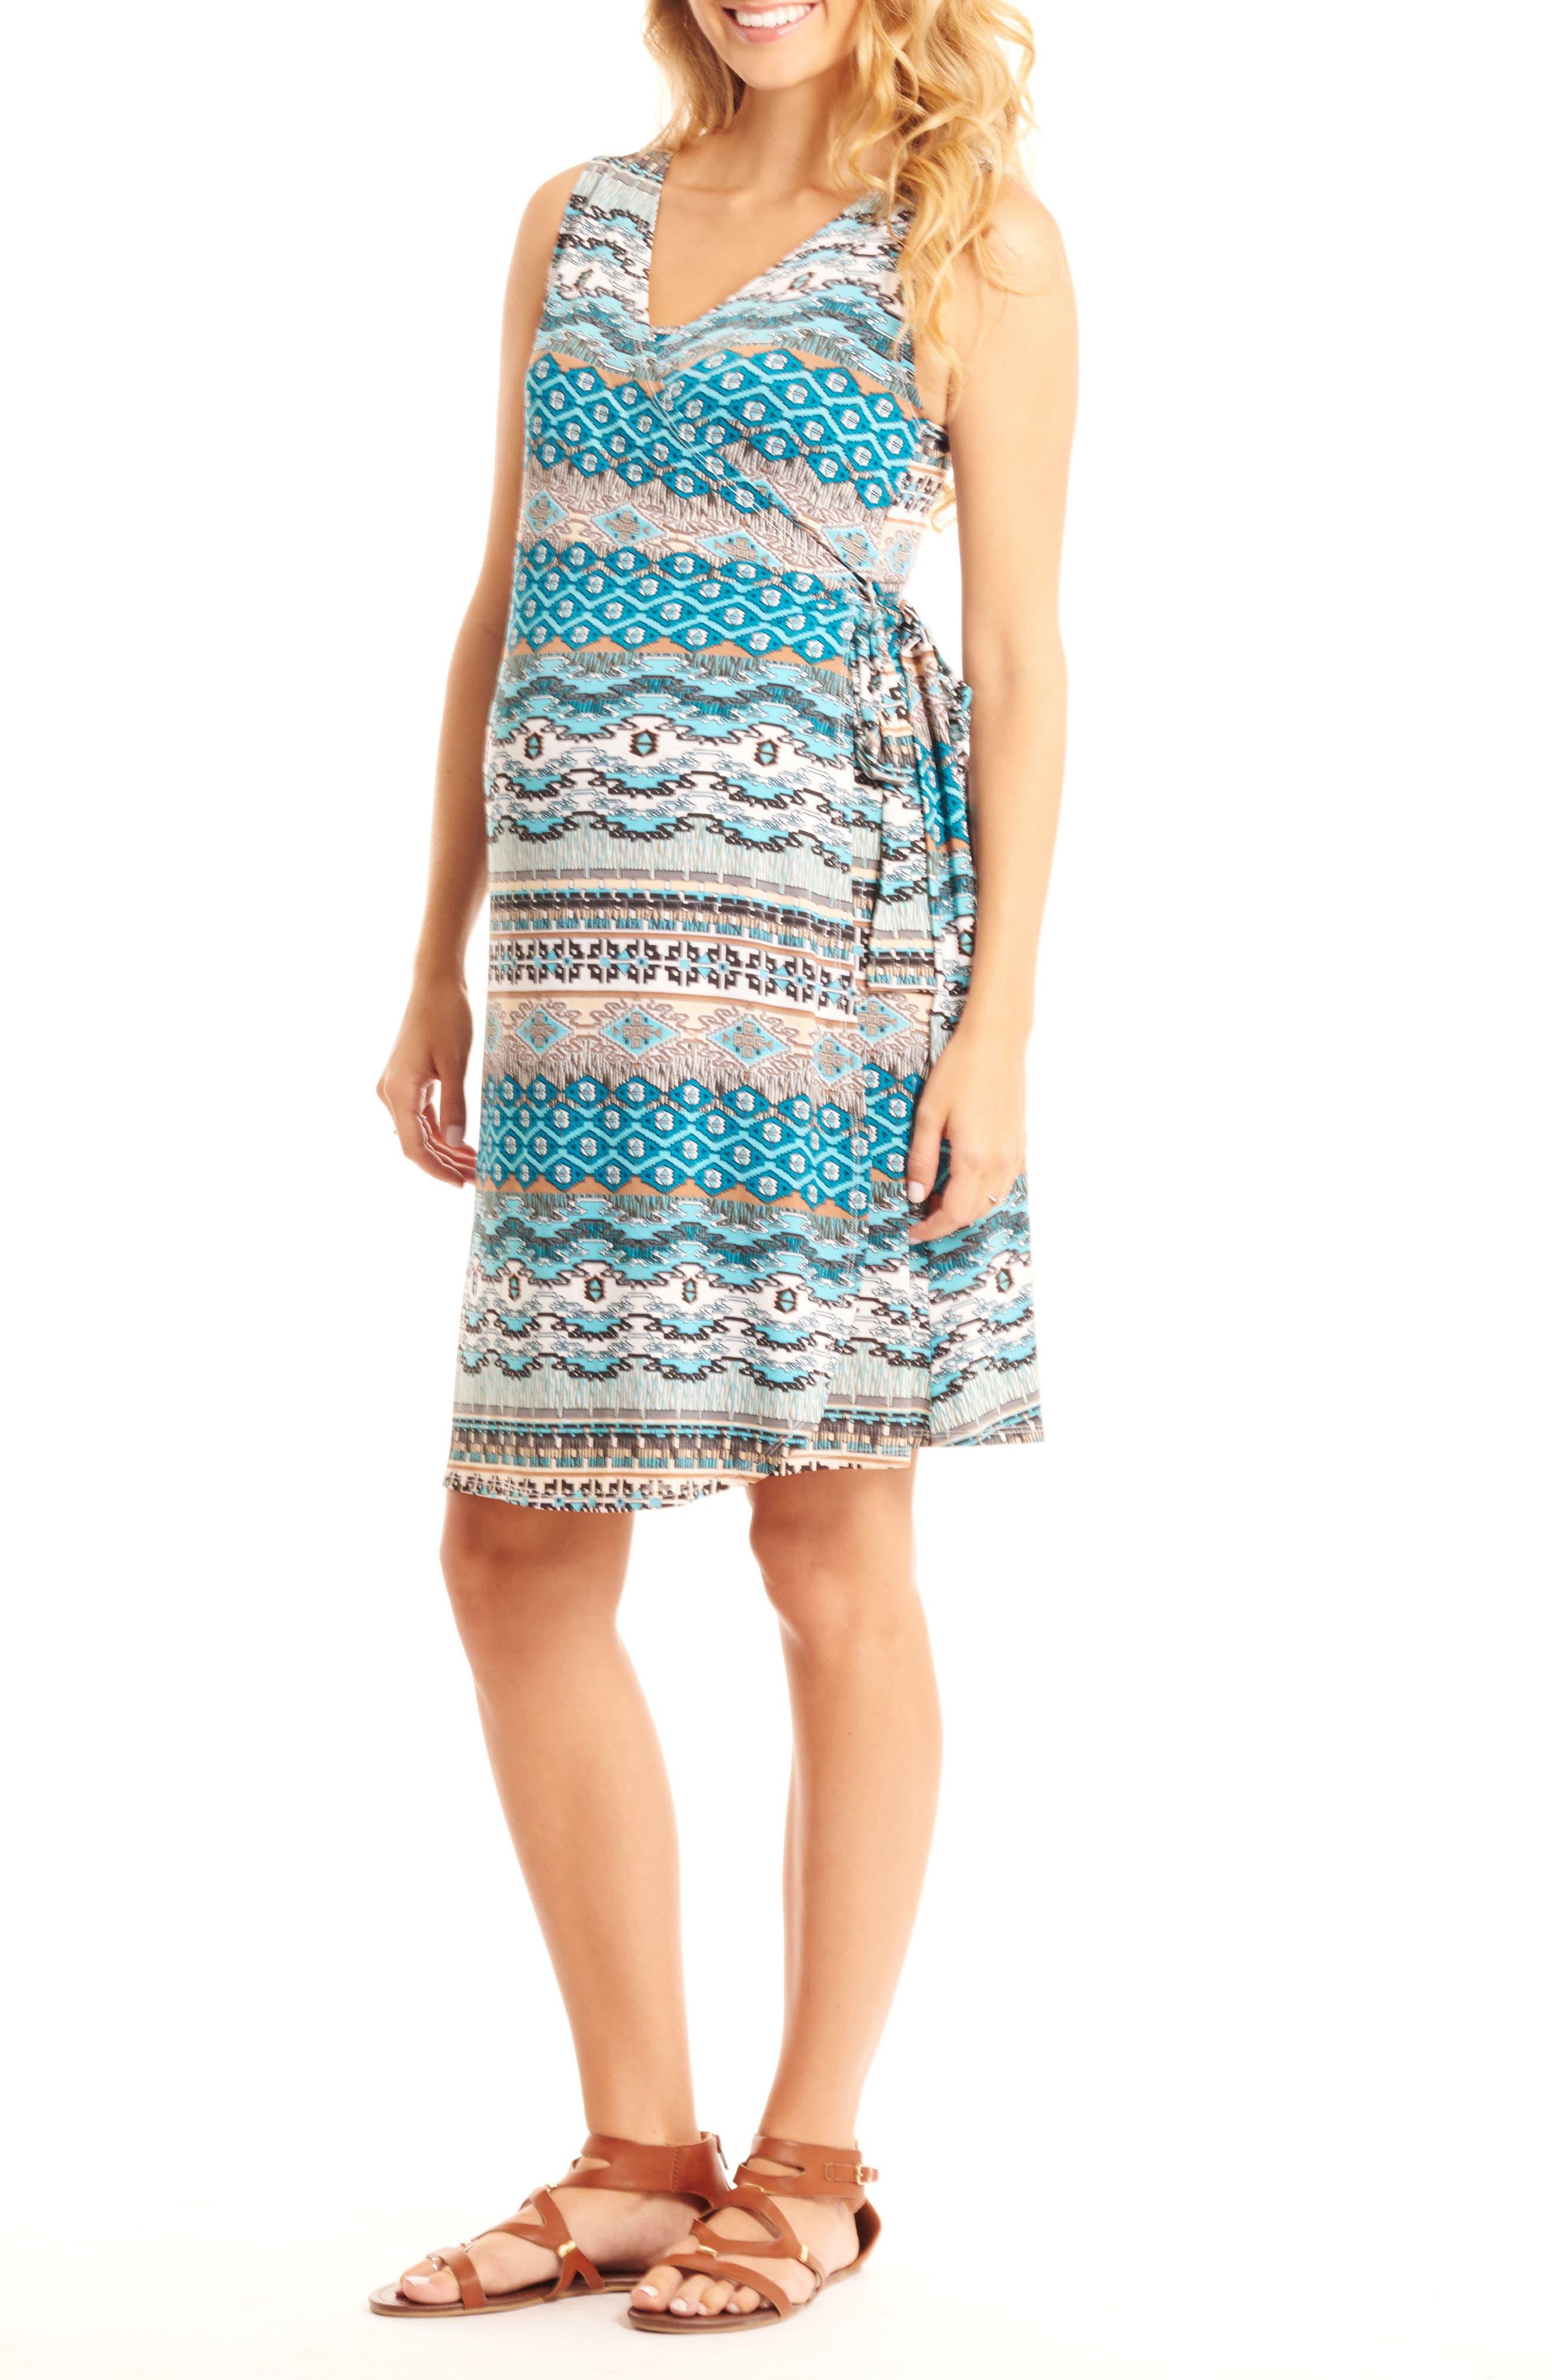 Everly Grey 'Tania' Sleeveless Maternity/Nursing Wrap Dress